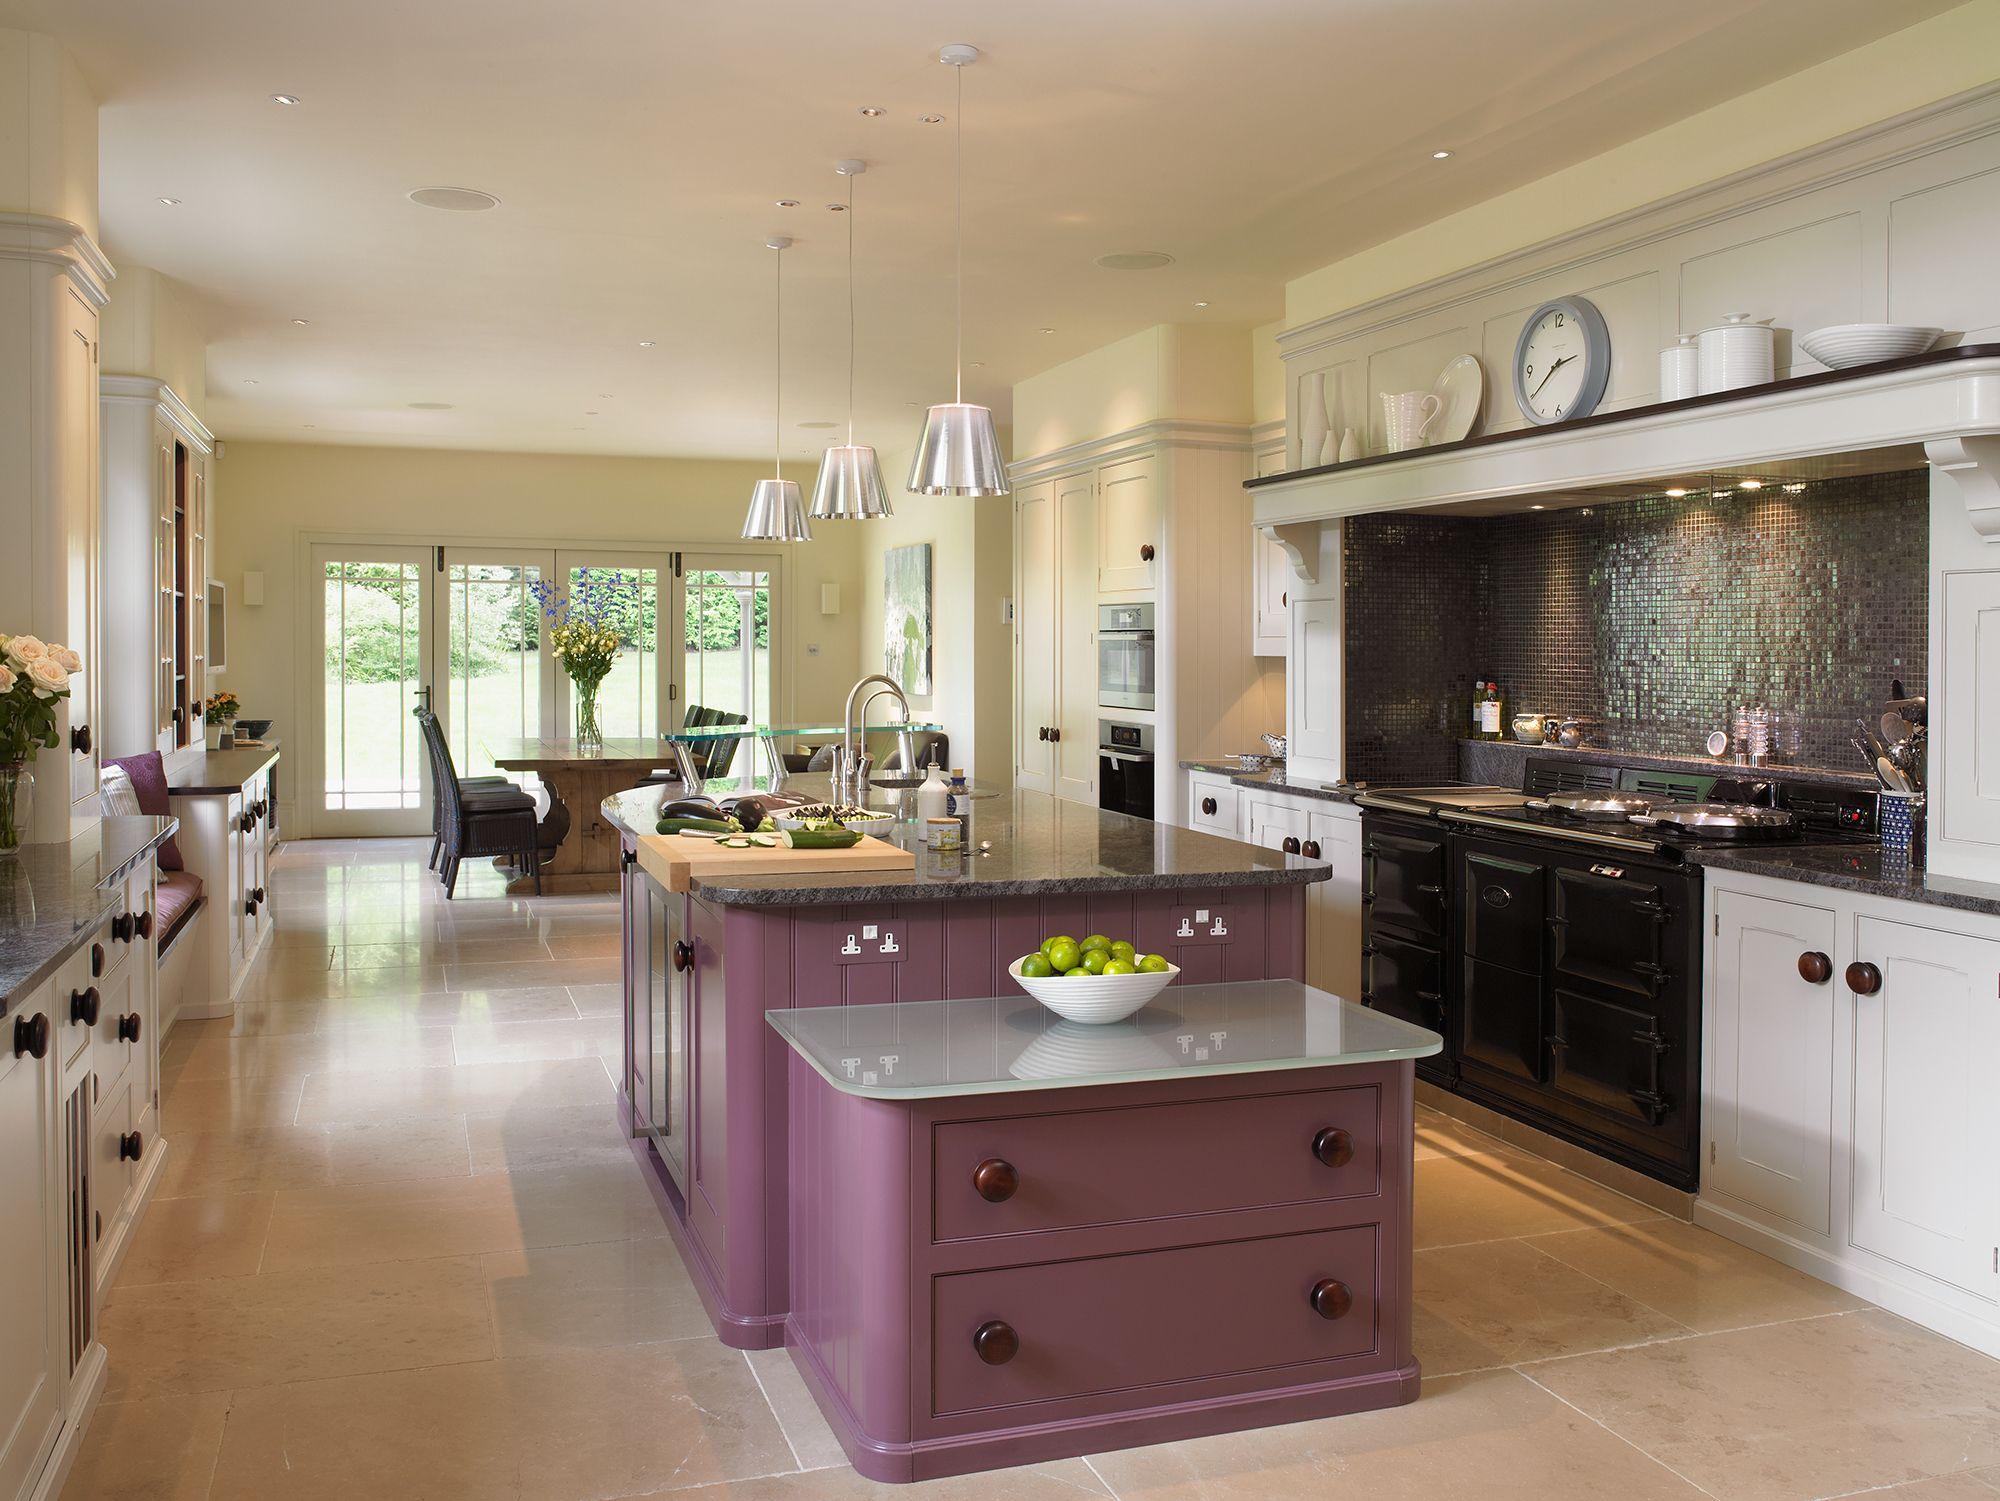 Luxury Bespoke Kitchens The Cook's Kitchen Mark